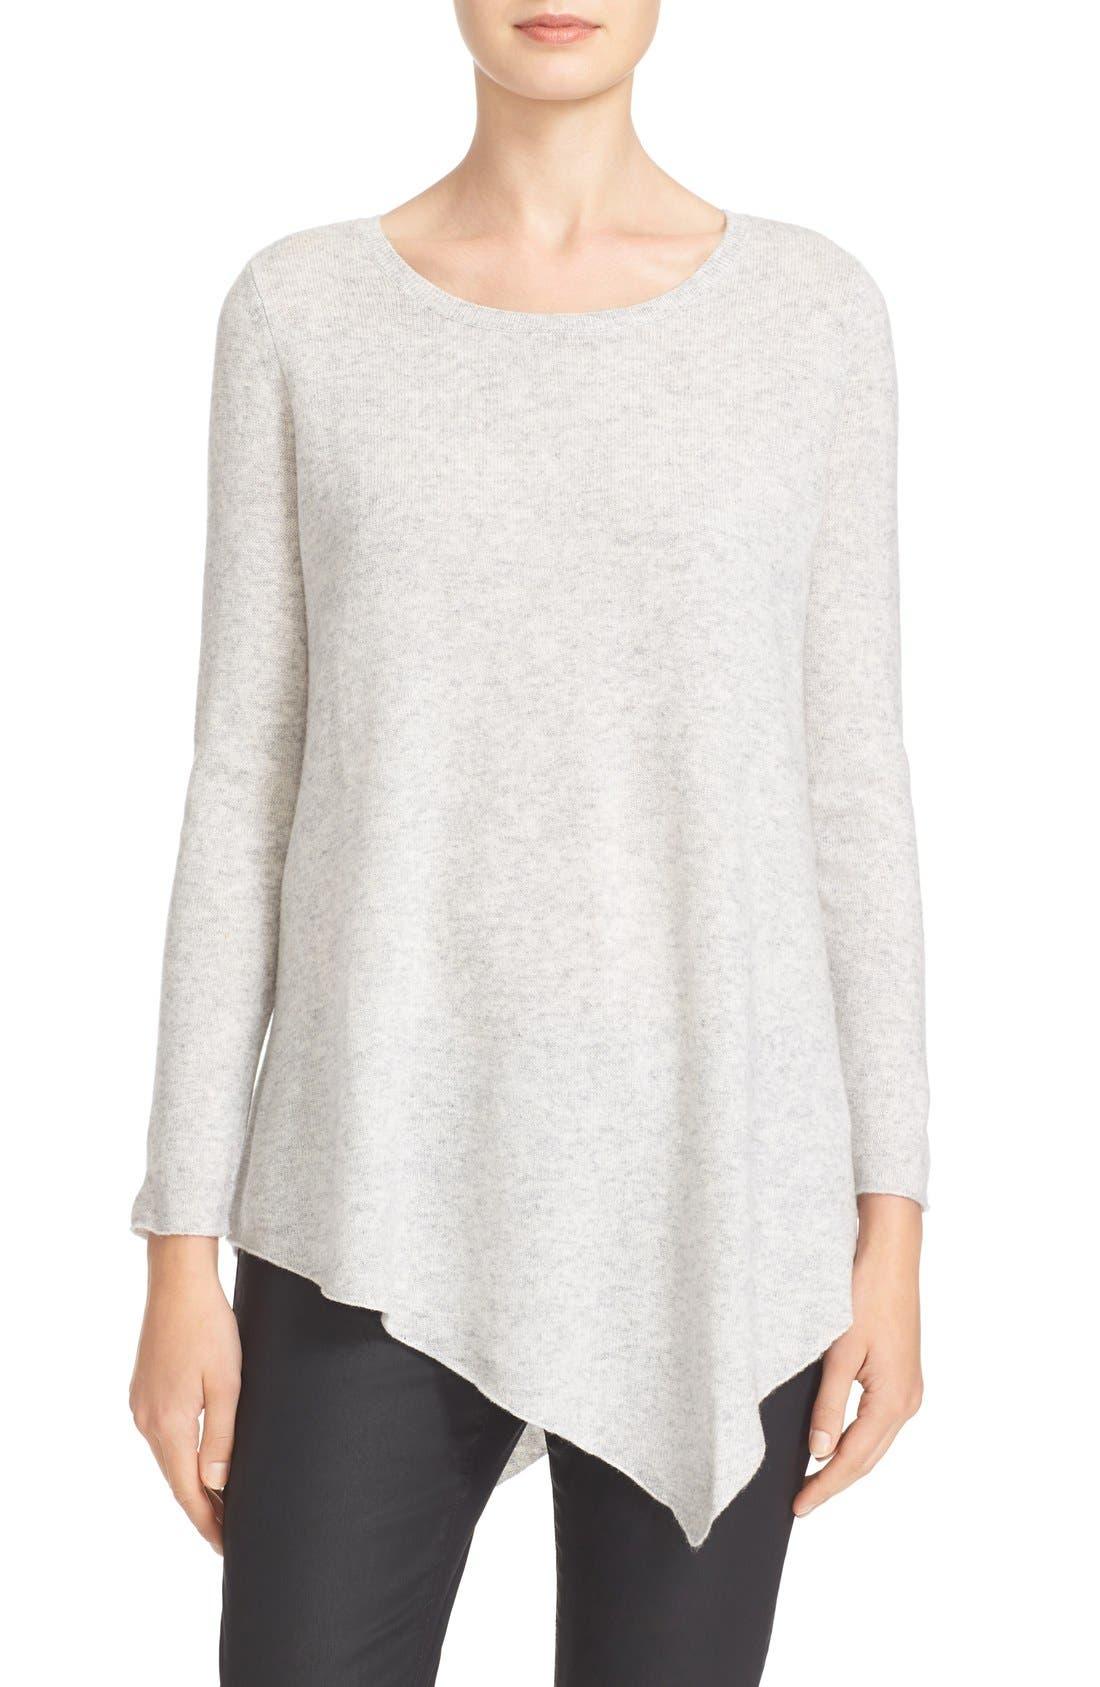 Main Image - Joie 'Tambrel' Asymmetrical Sweater Tunic